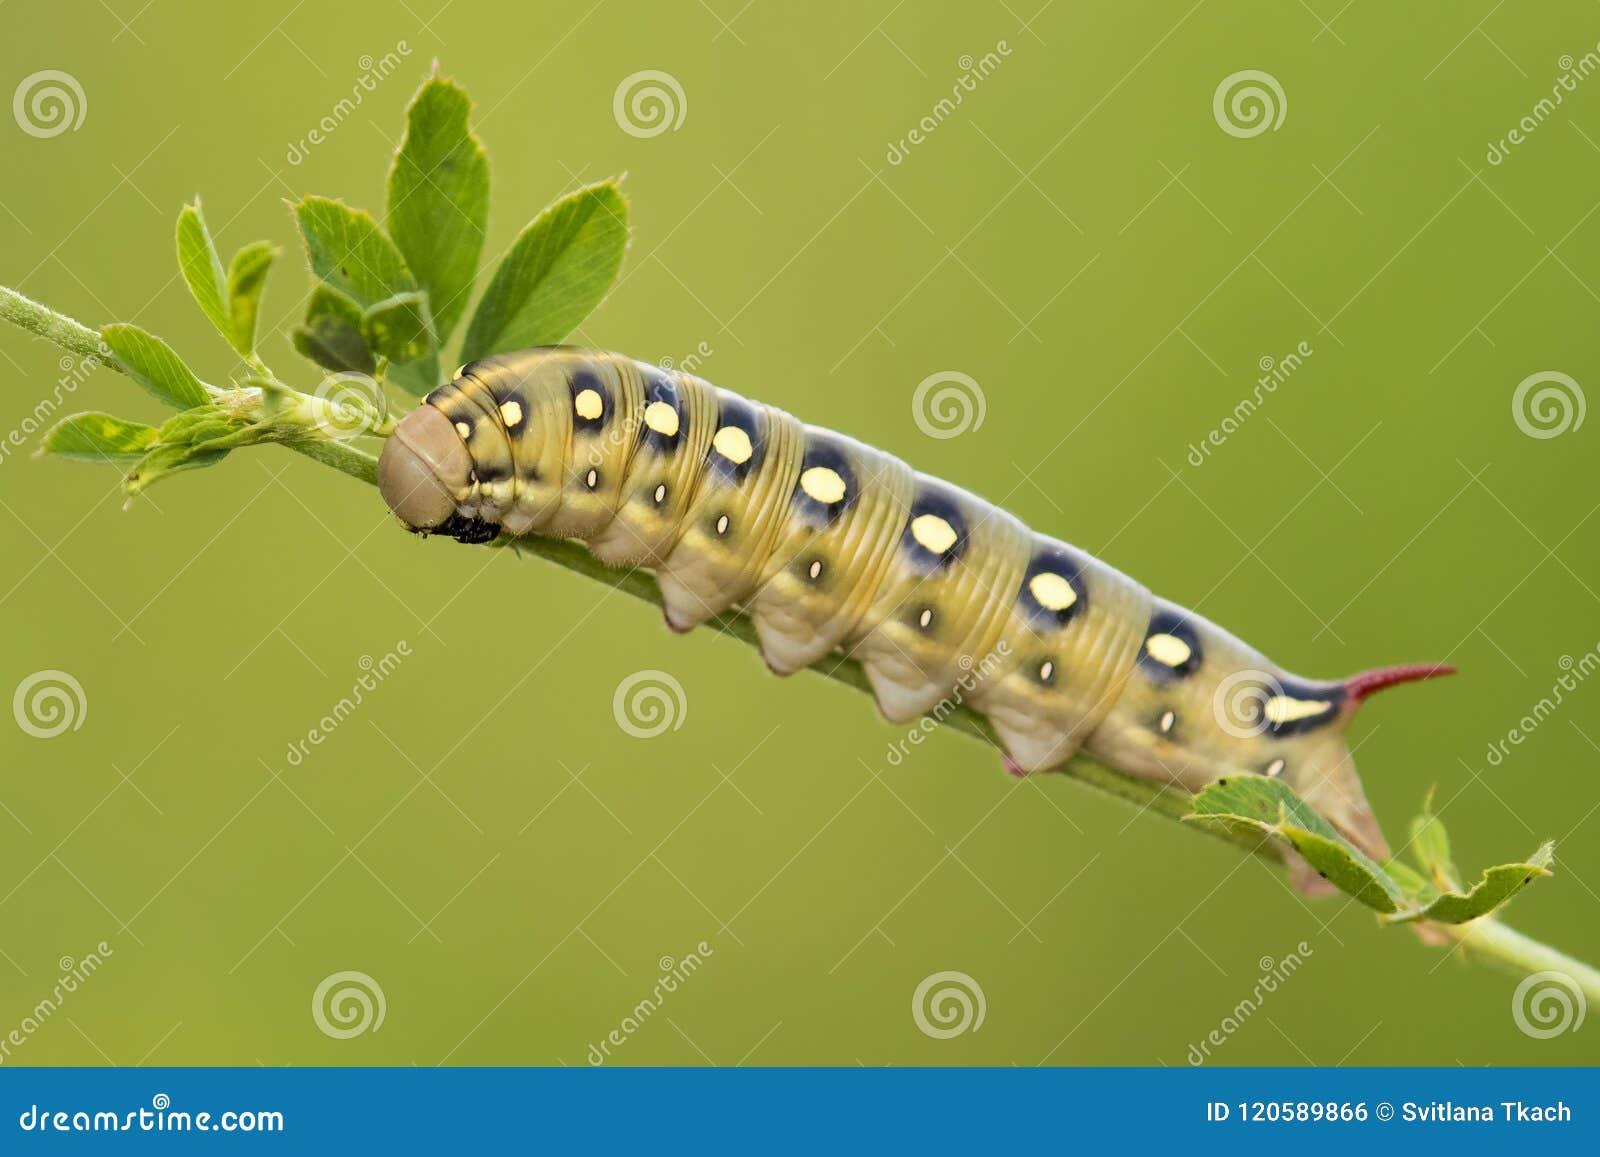 Caterpillar Bedstraw ćma Hyles gallii od Ukraina